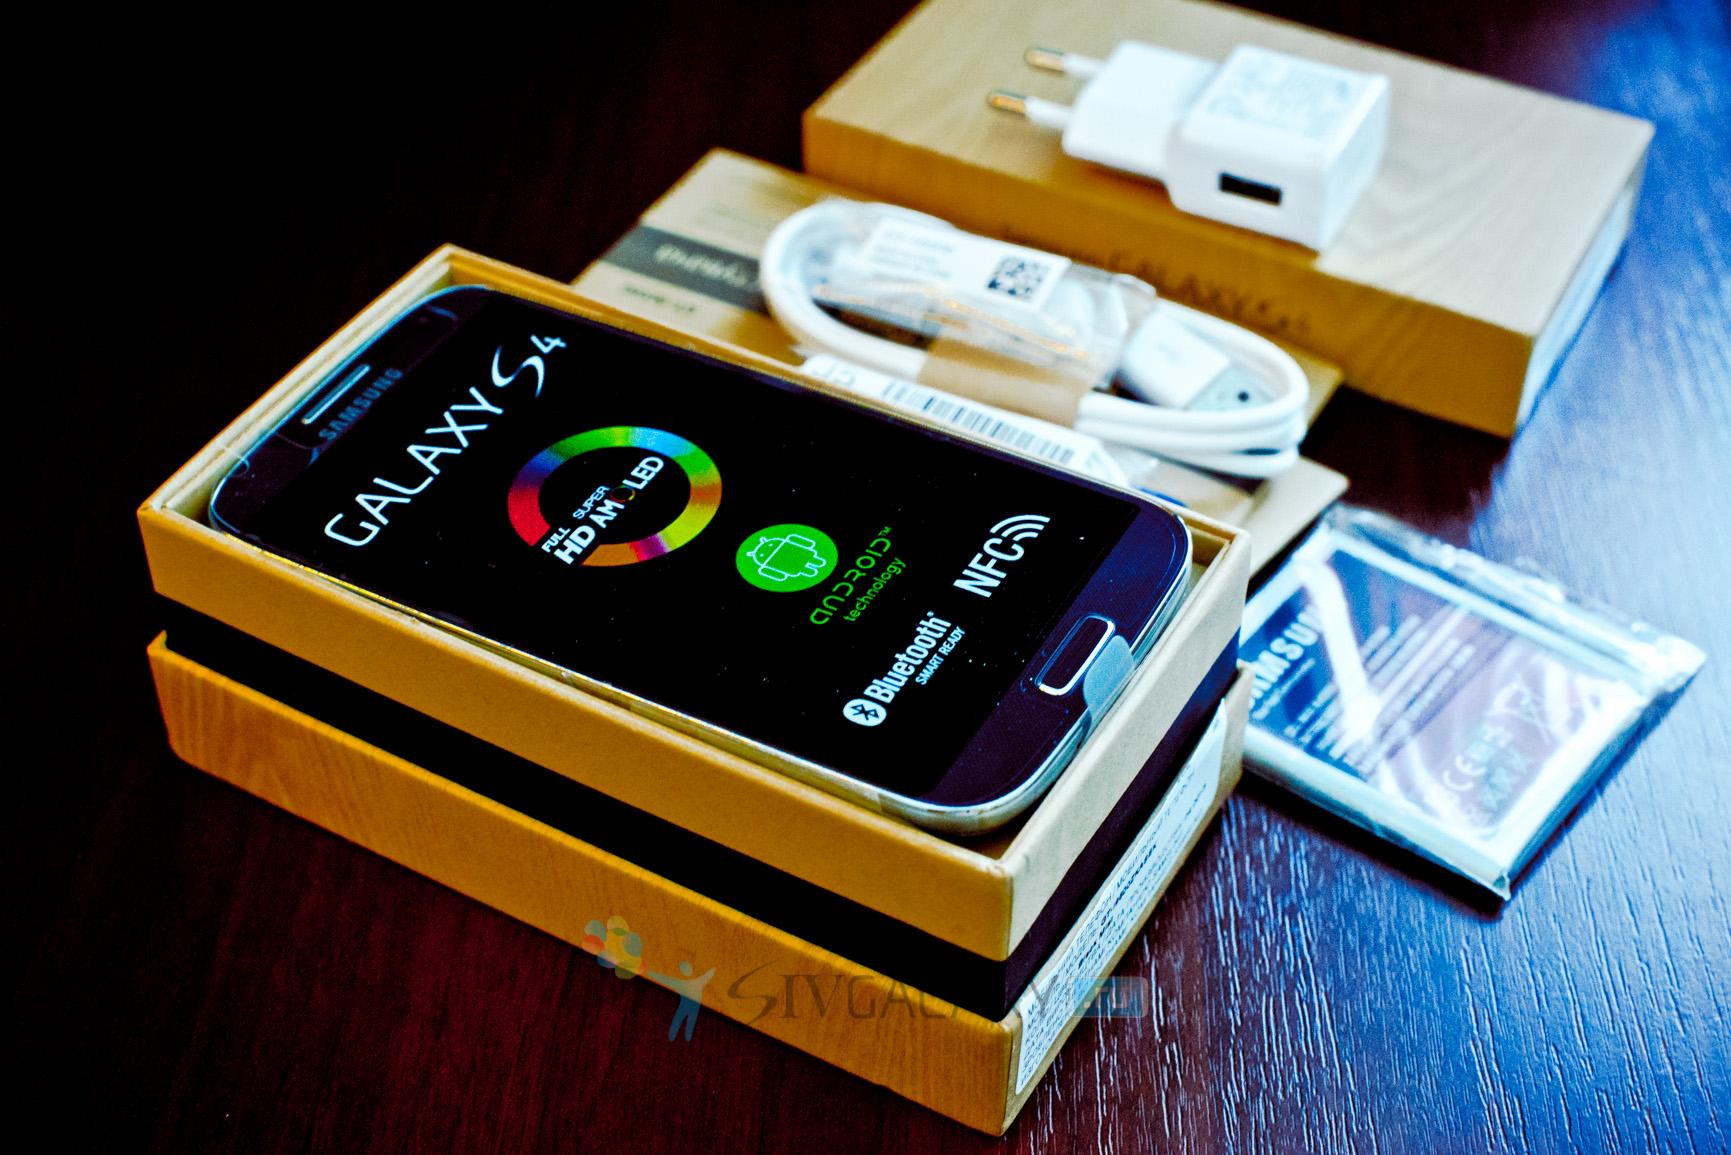 Комплект поставки Samsung Galaxy S4